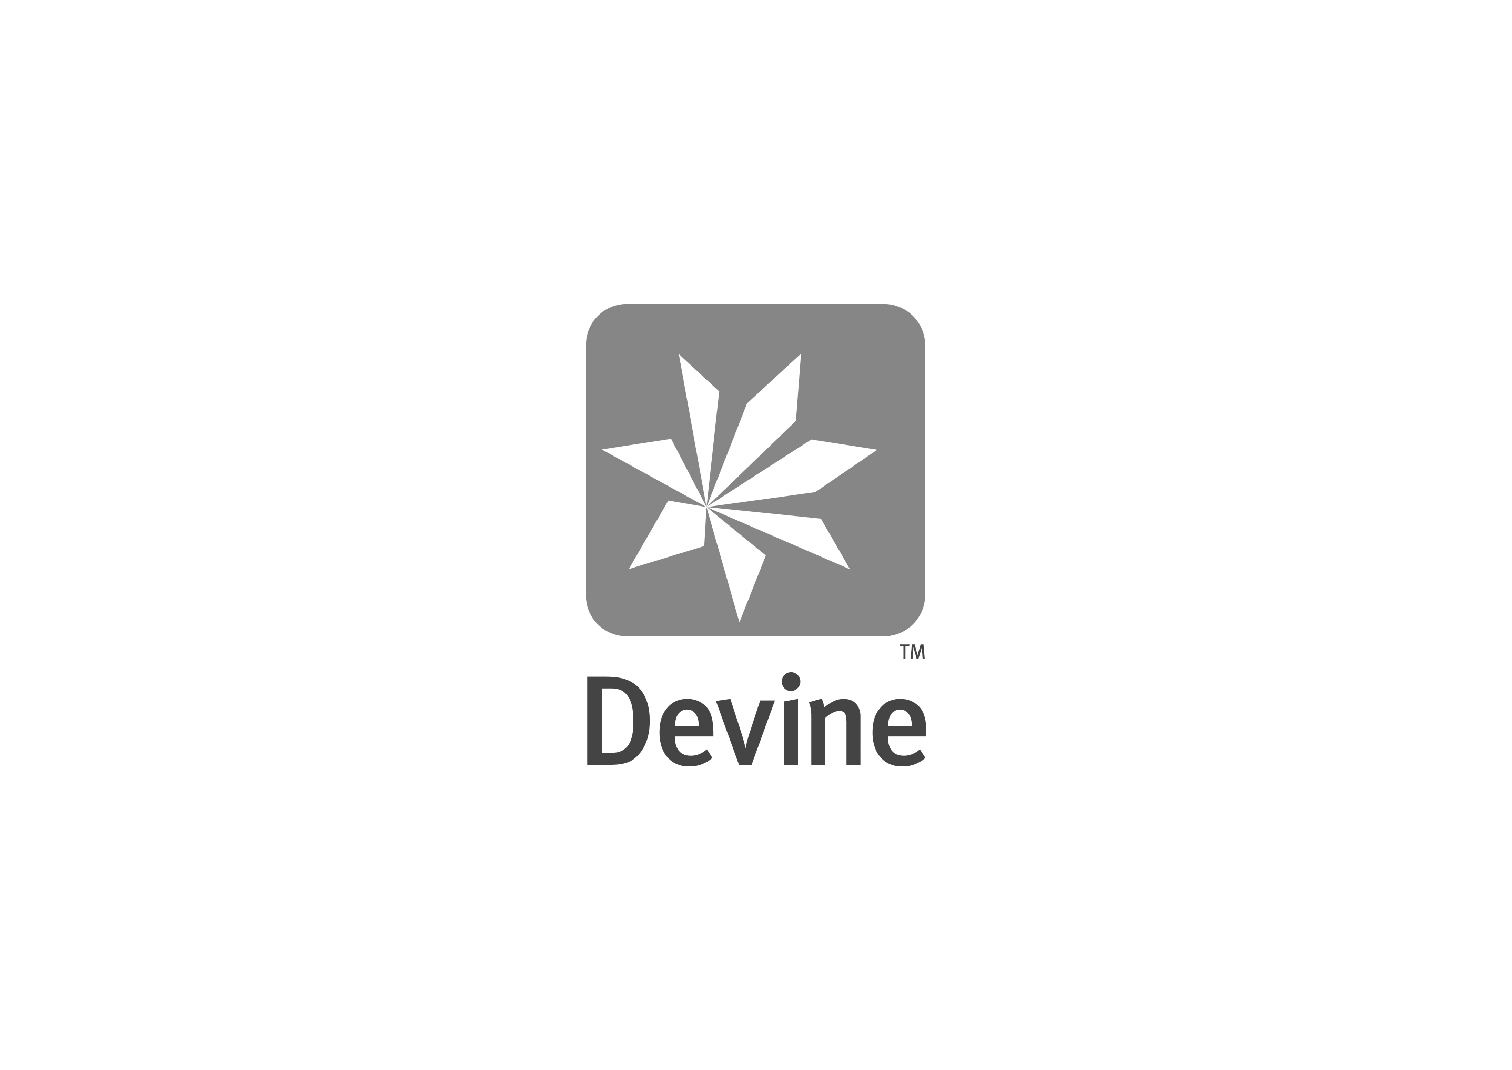 Devine-01.jpg